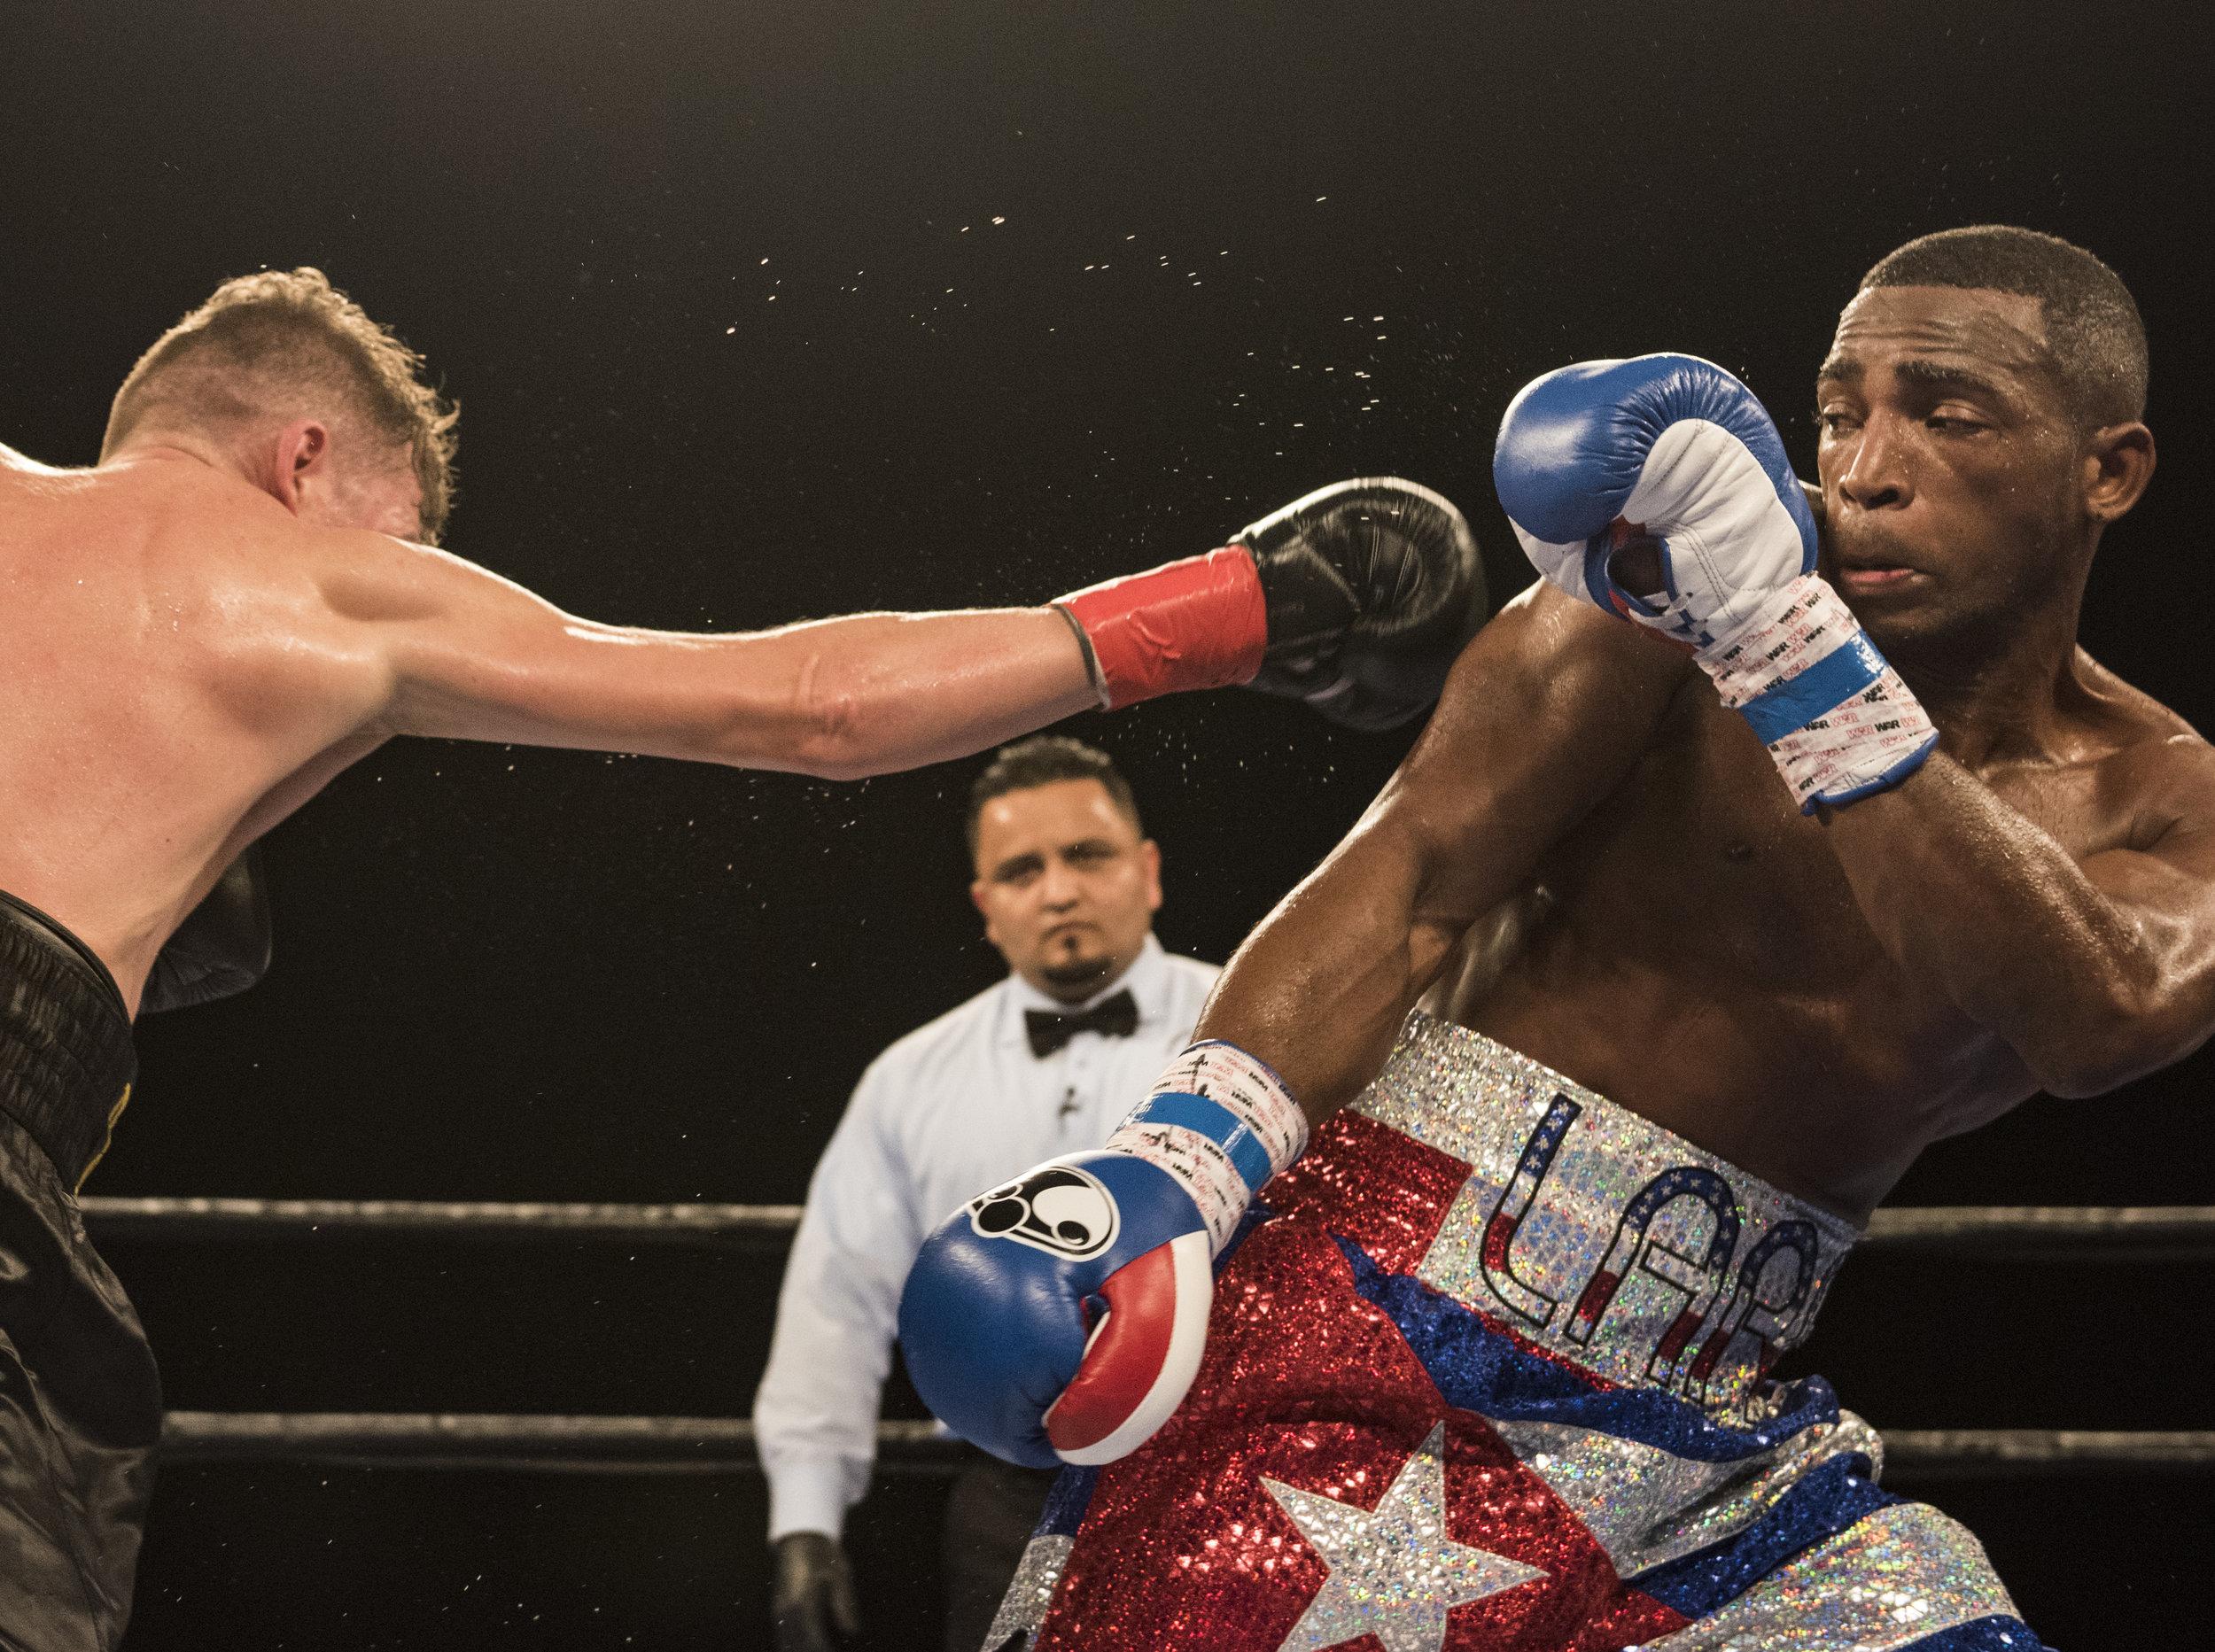 Cuban boxer Erislandy Lara dodges a punch from Yuri Foreman during their fight at Hialeah Casino Park.